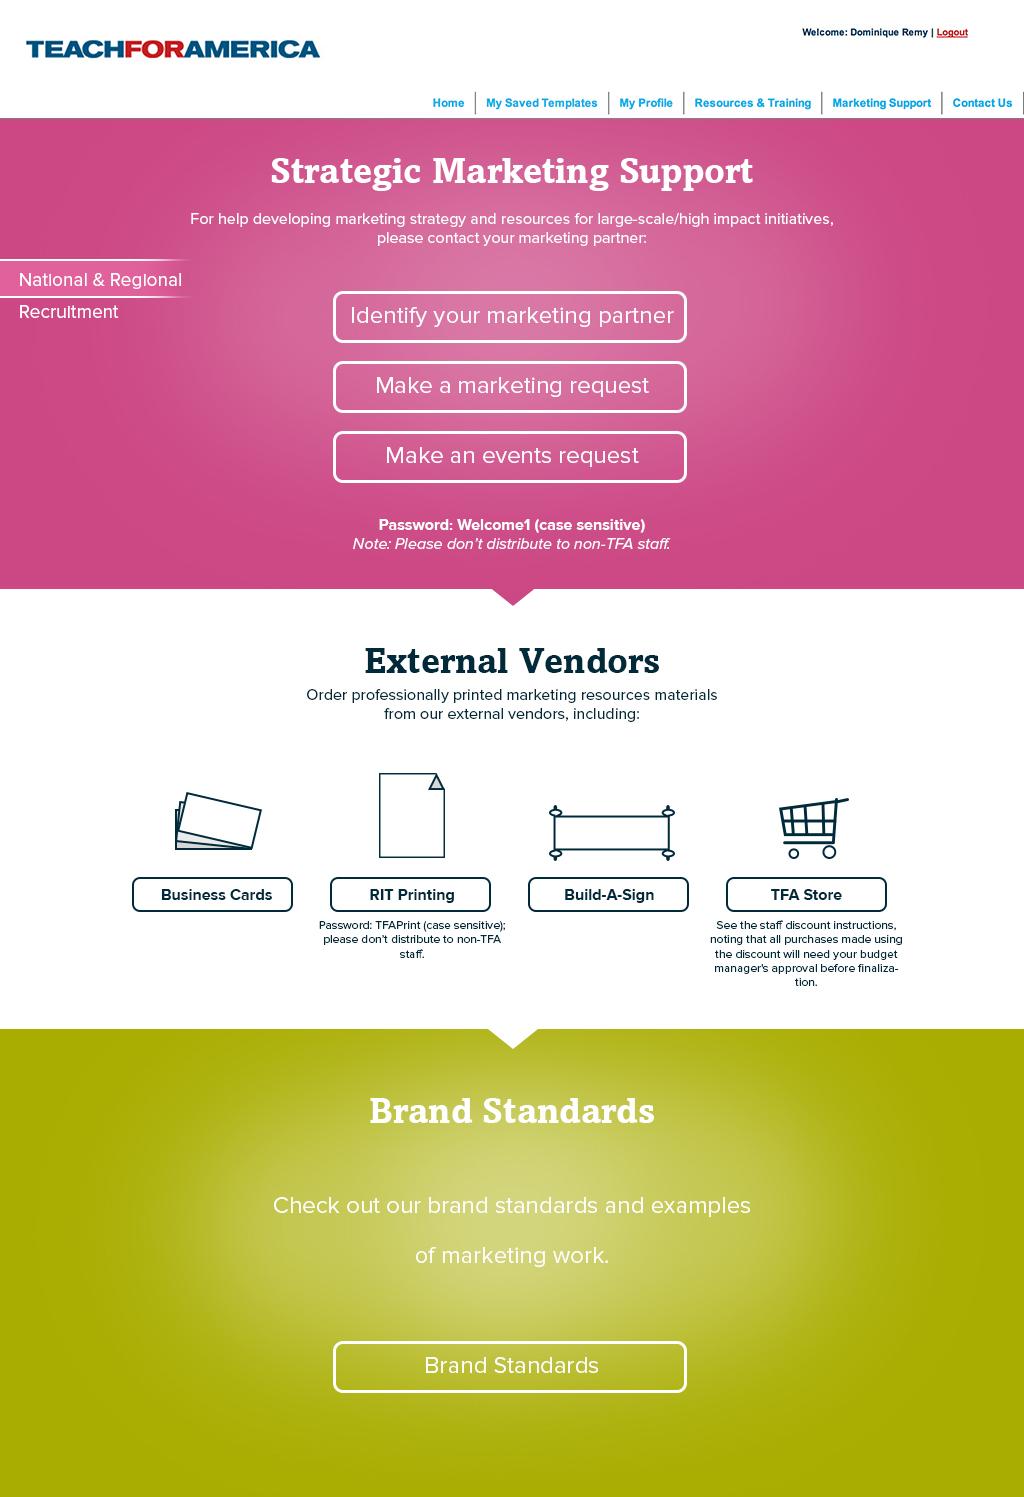 MarketingSupport.jpg